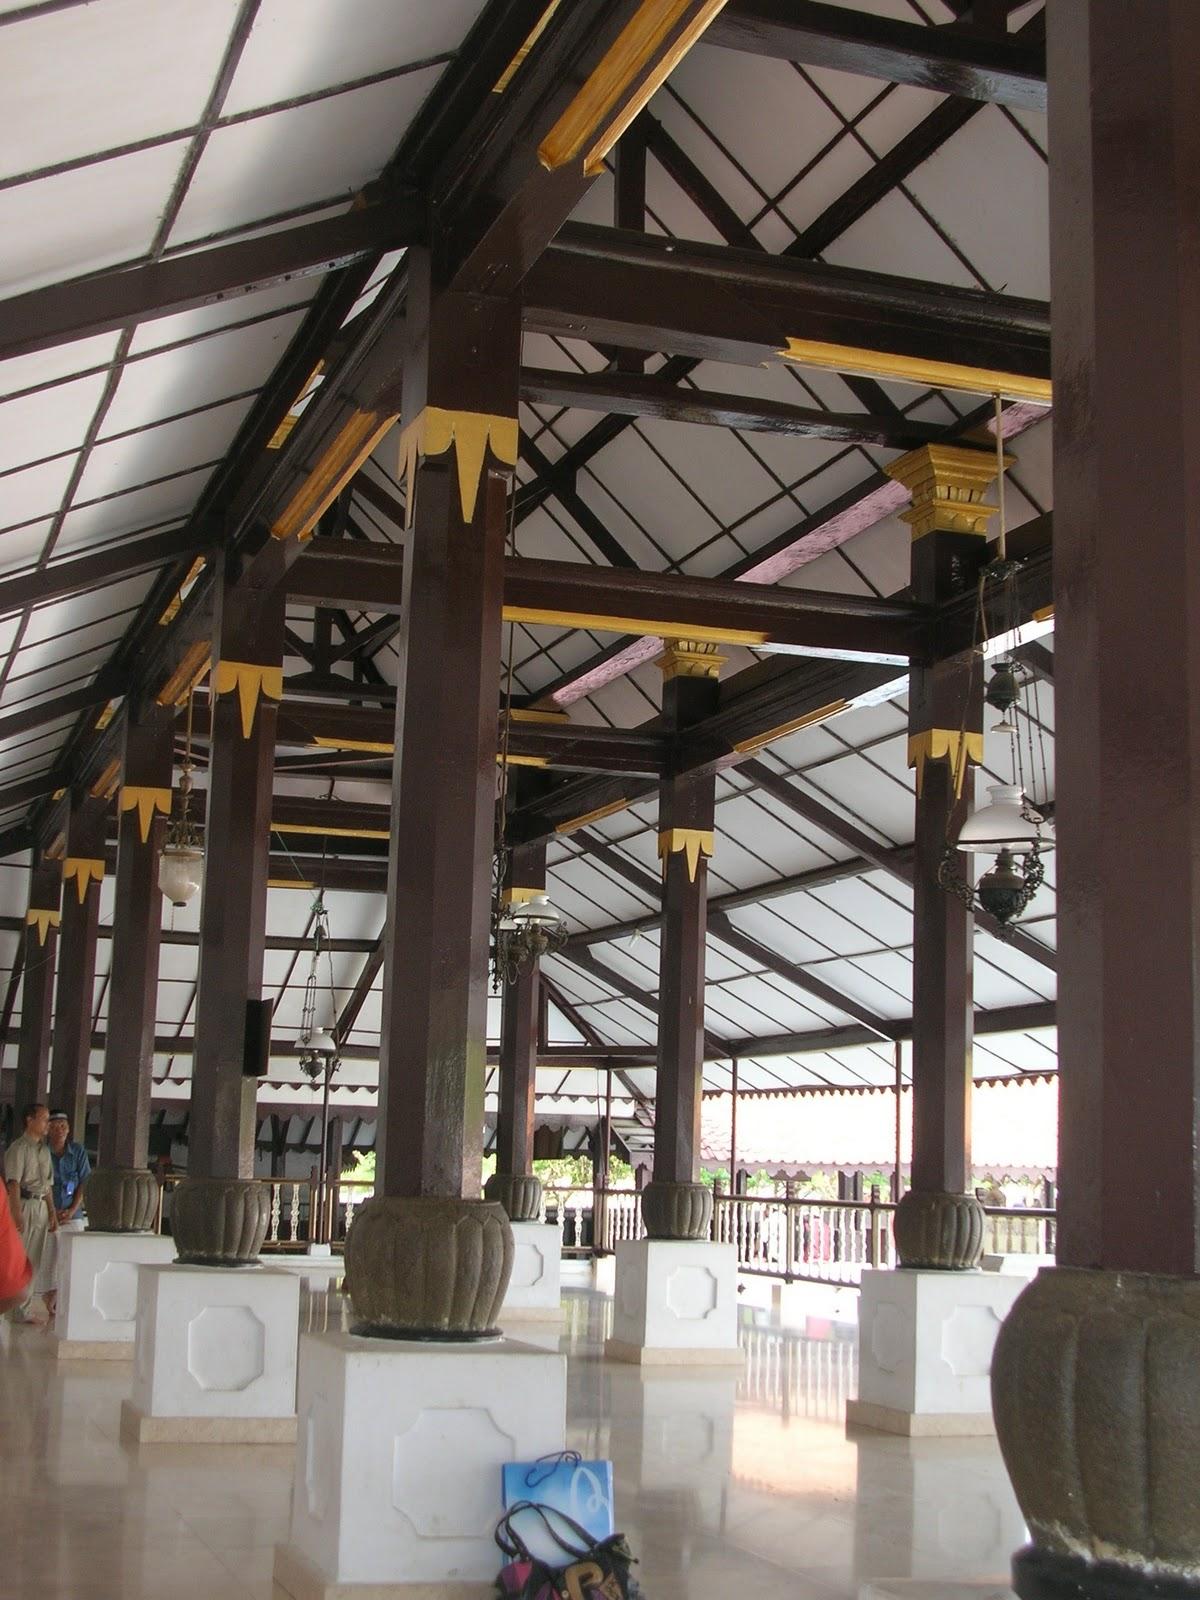 Masjid Agung Banten Sarat Nilai Islam Multi Budaya Tetapi Sebenarnya